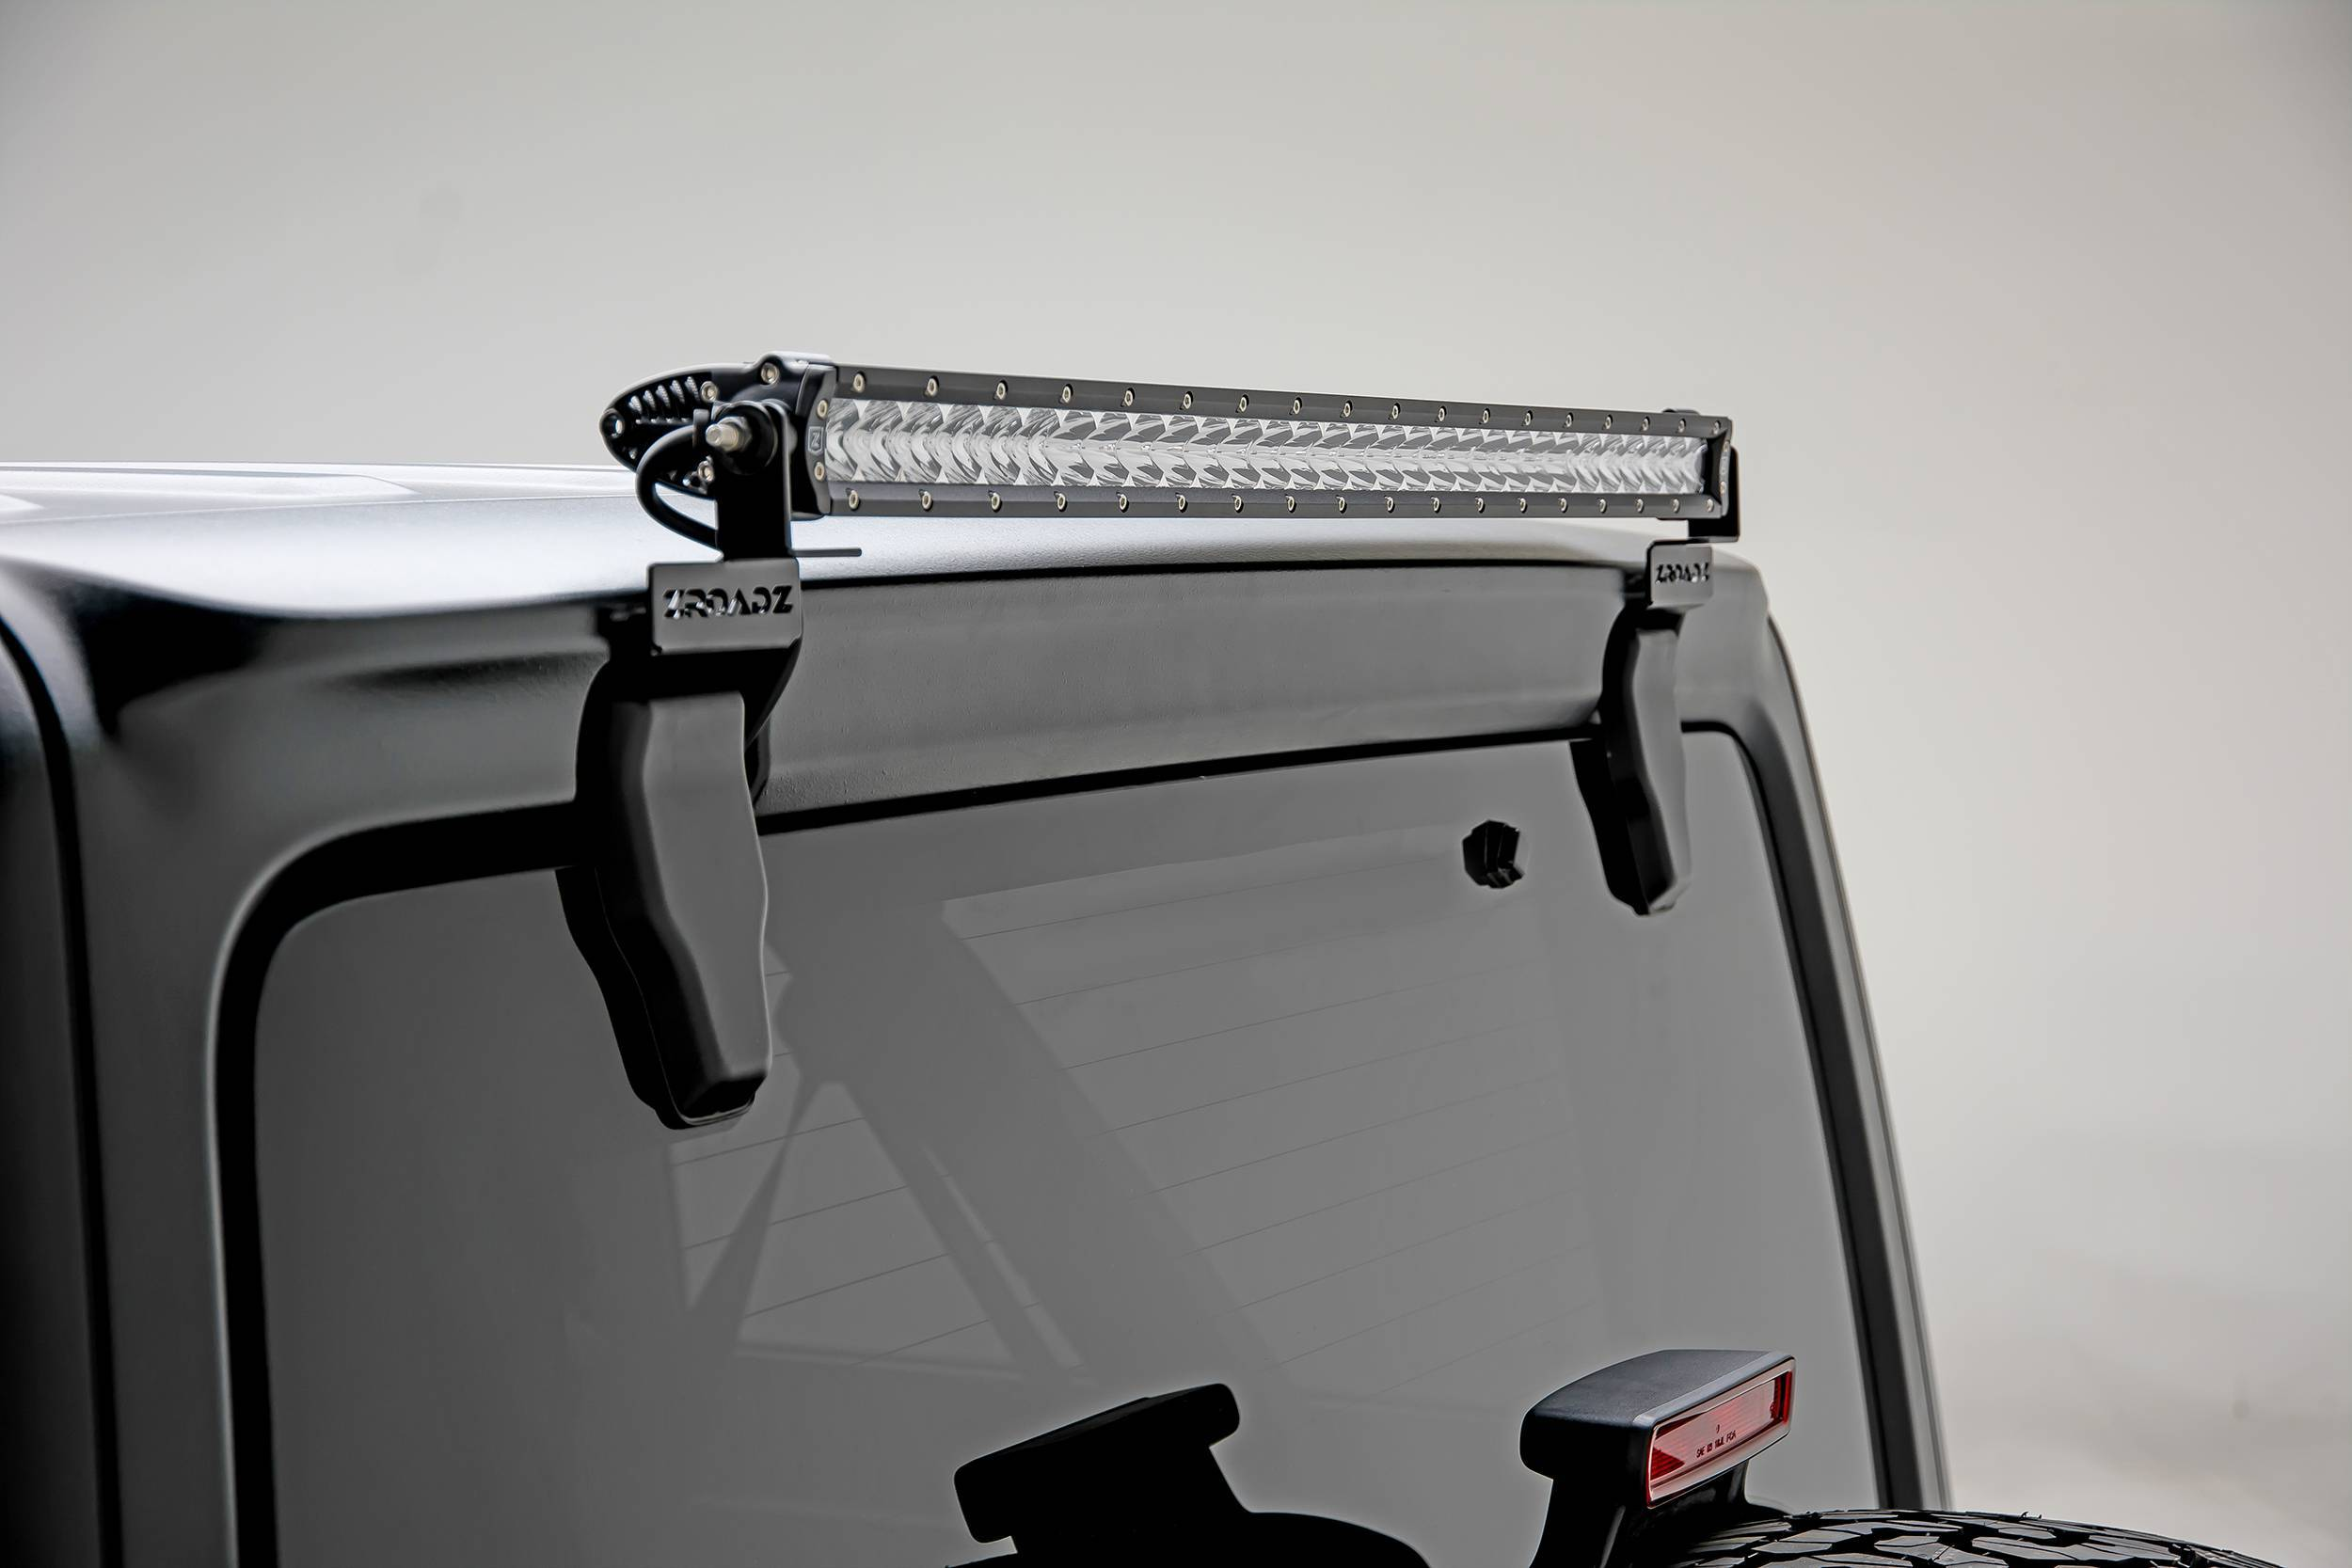 ZROADZ OFF ROAD PRODUCTS - 2018-2021 Jeep JL Rear Window LED Bracket to mount (1) 30 Inch Staight Single Row LED Light Bar - PN #Z394931